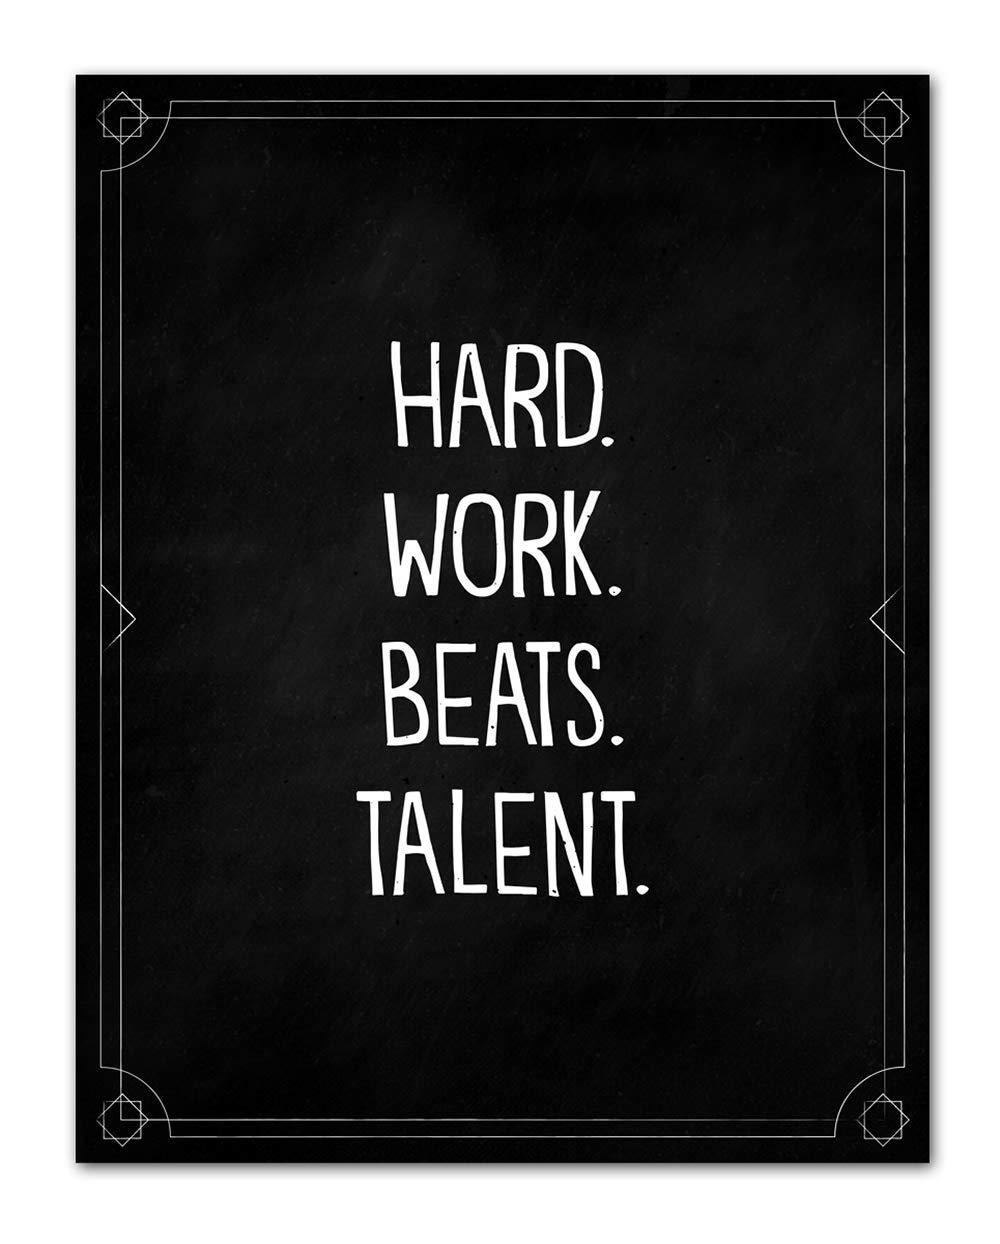 Hard. Work. Beats. Talent. At the price - Blackboard Art Popular brand in the world Wall Motivational